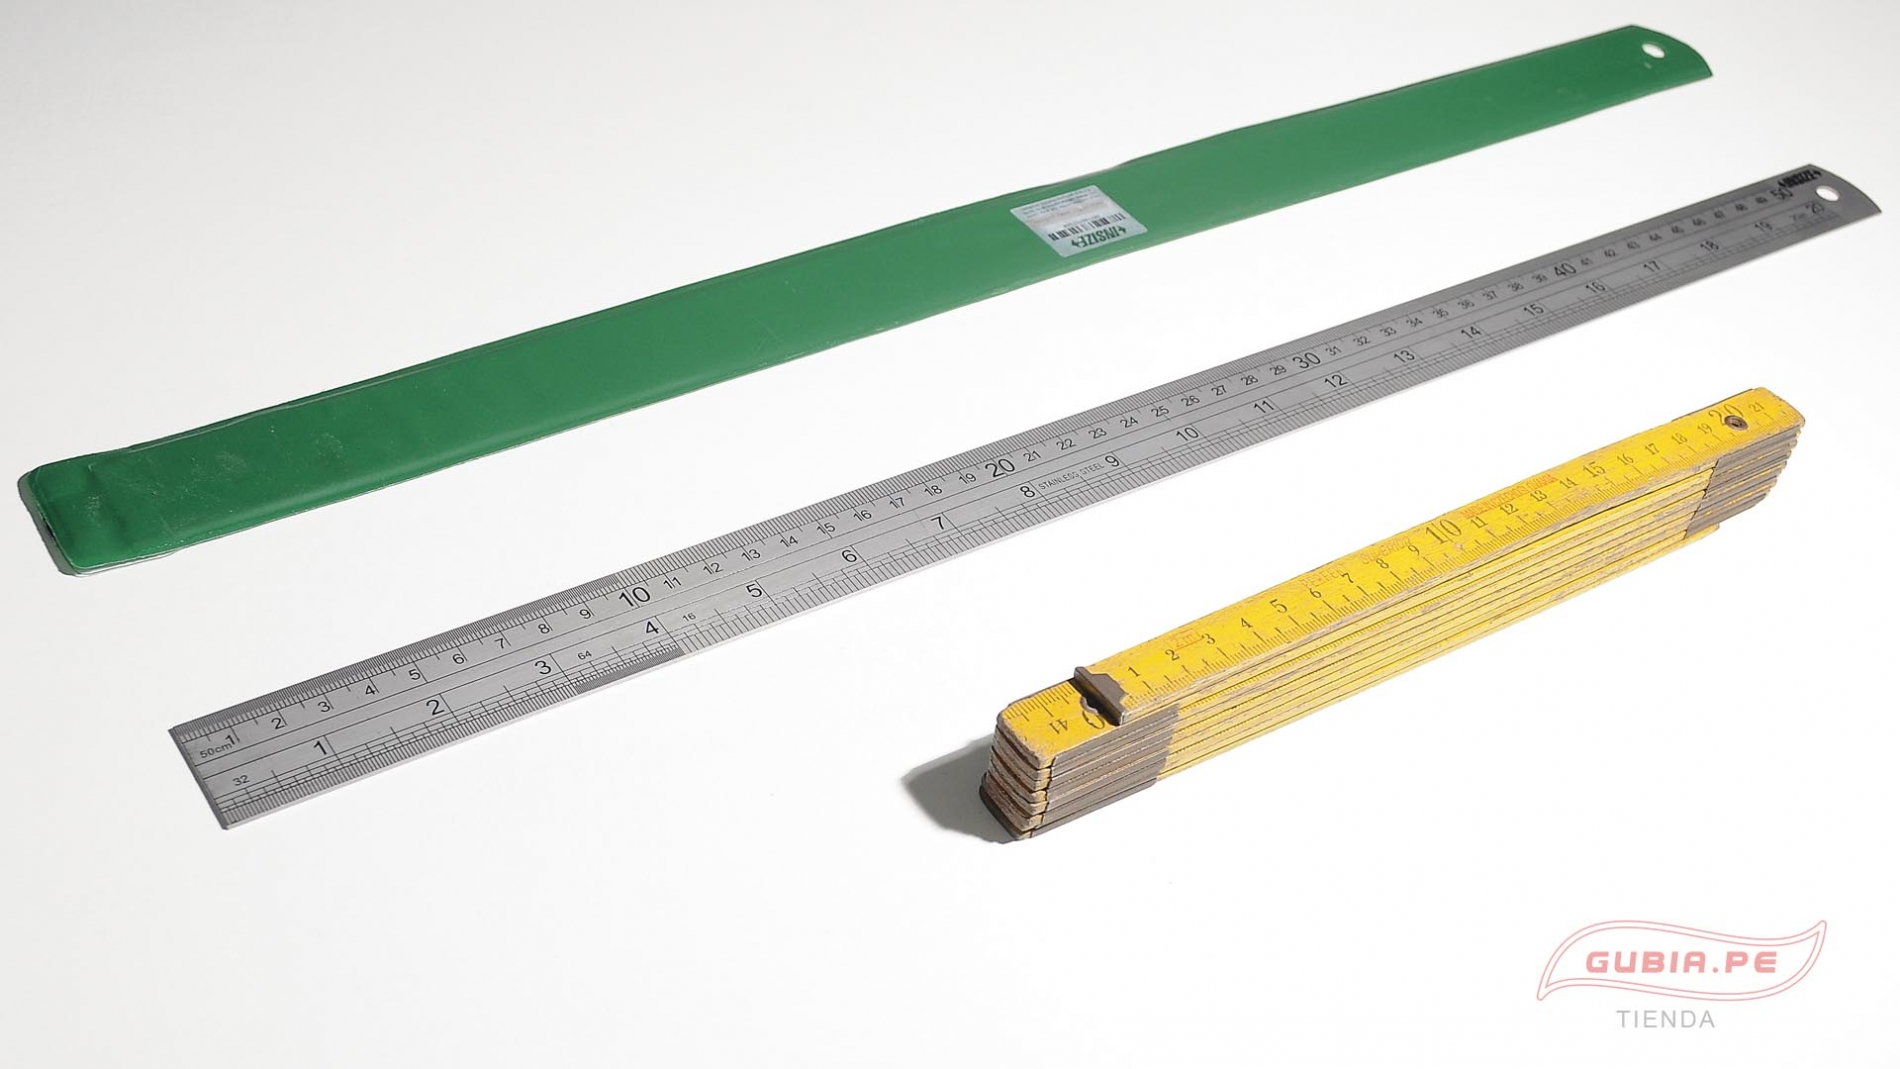 7110-500-Regla inoxidable 500mm Insize 7110-500-max-1.